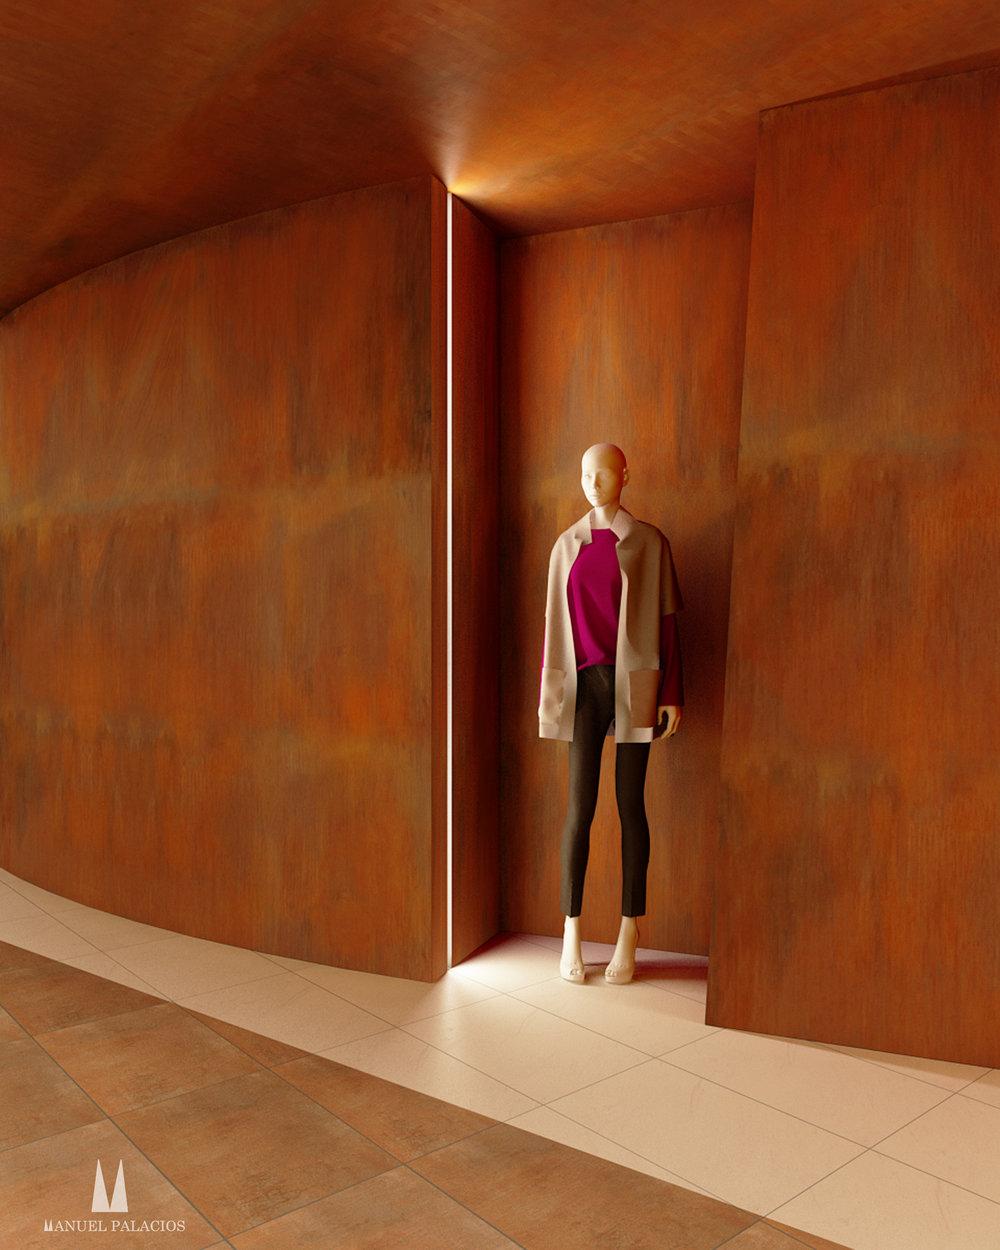 stephane chapelet design museo del traje